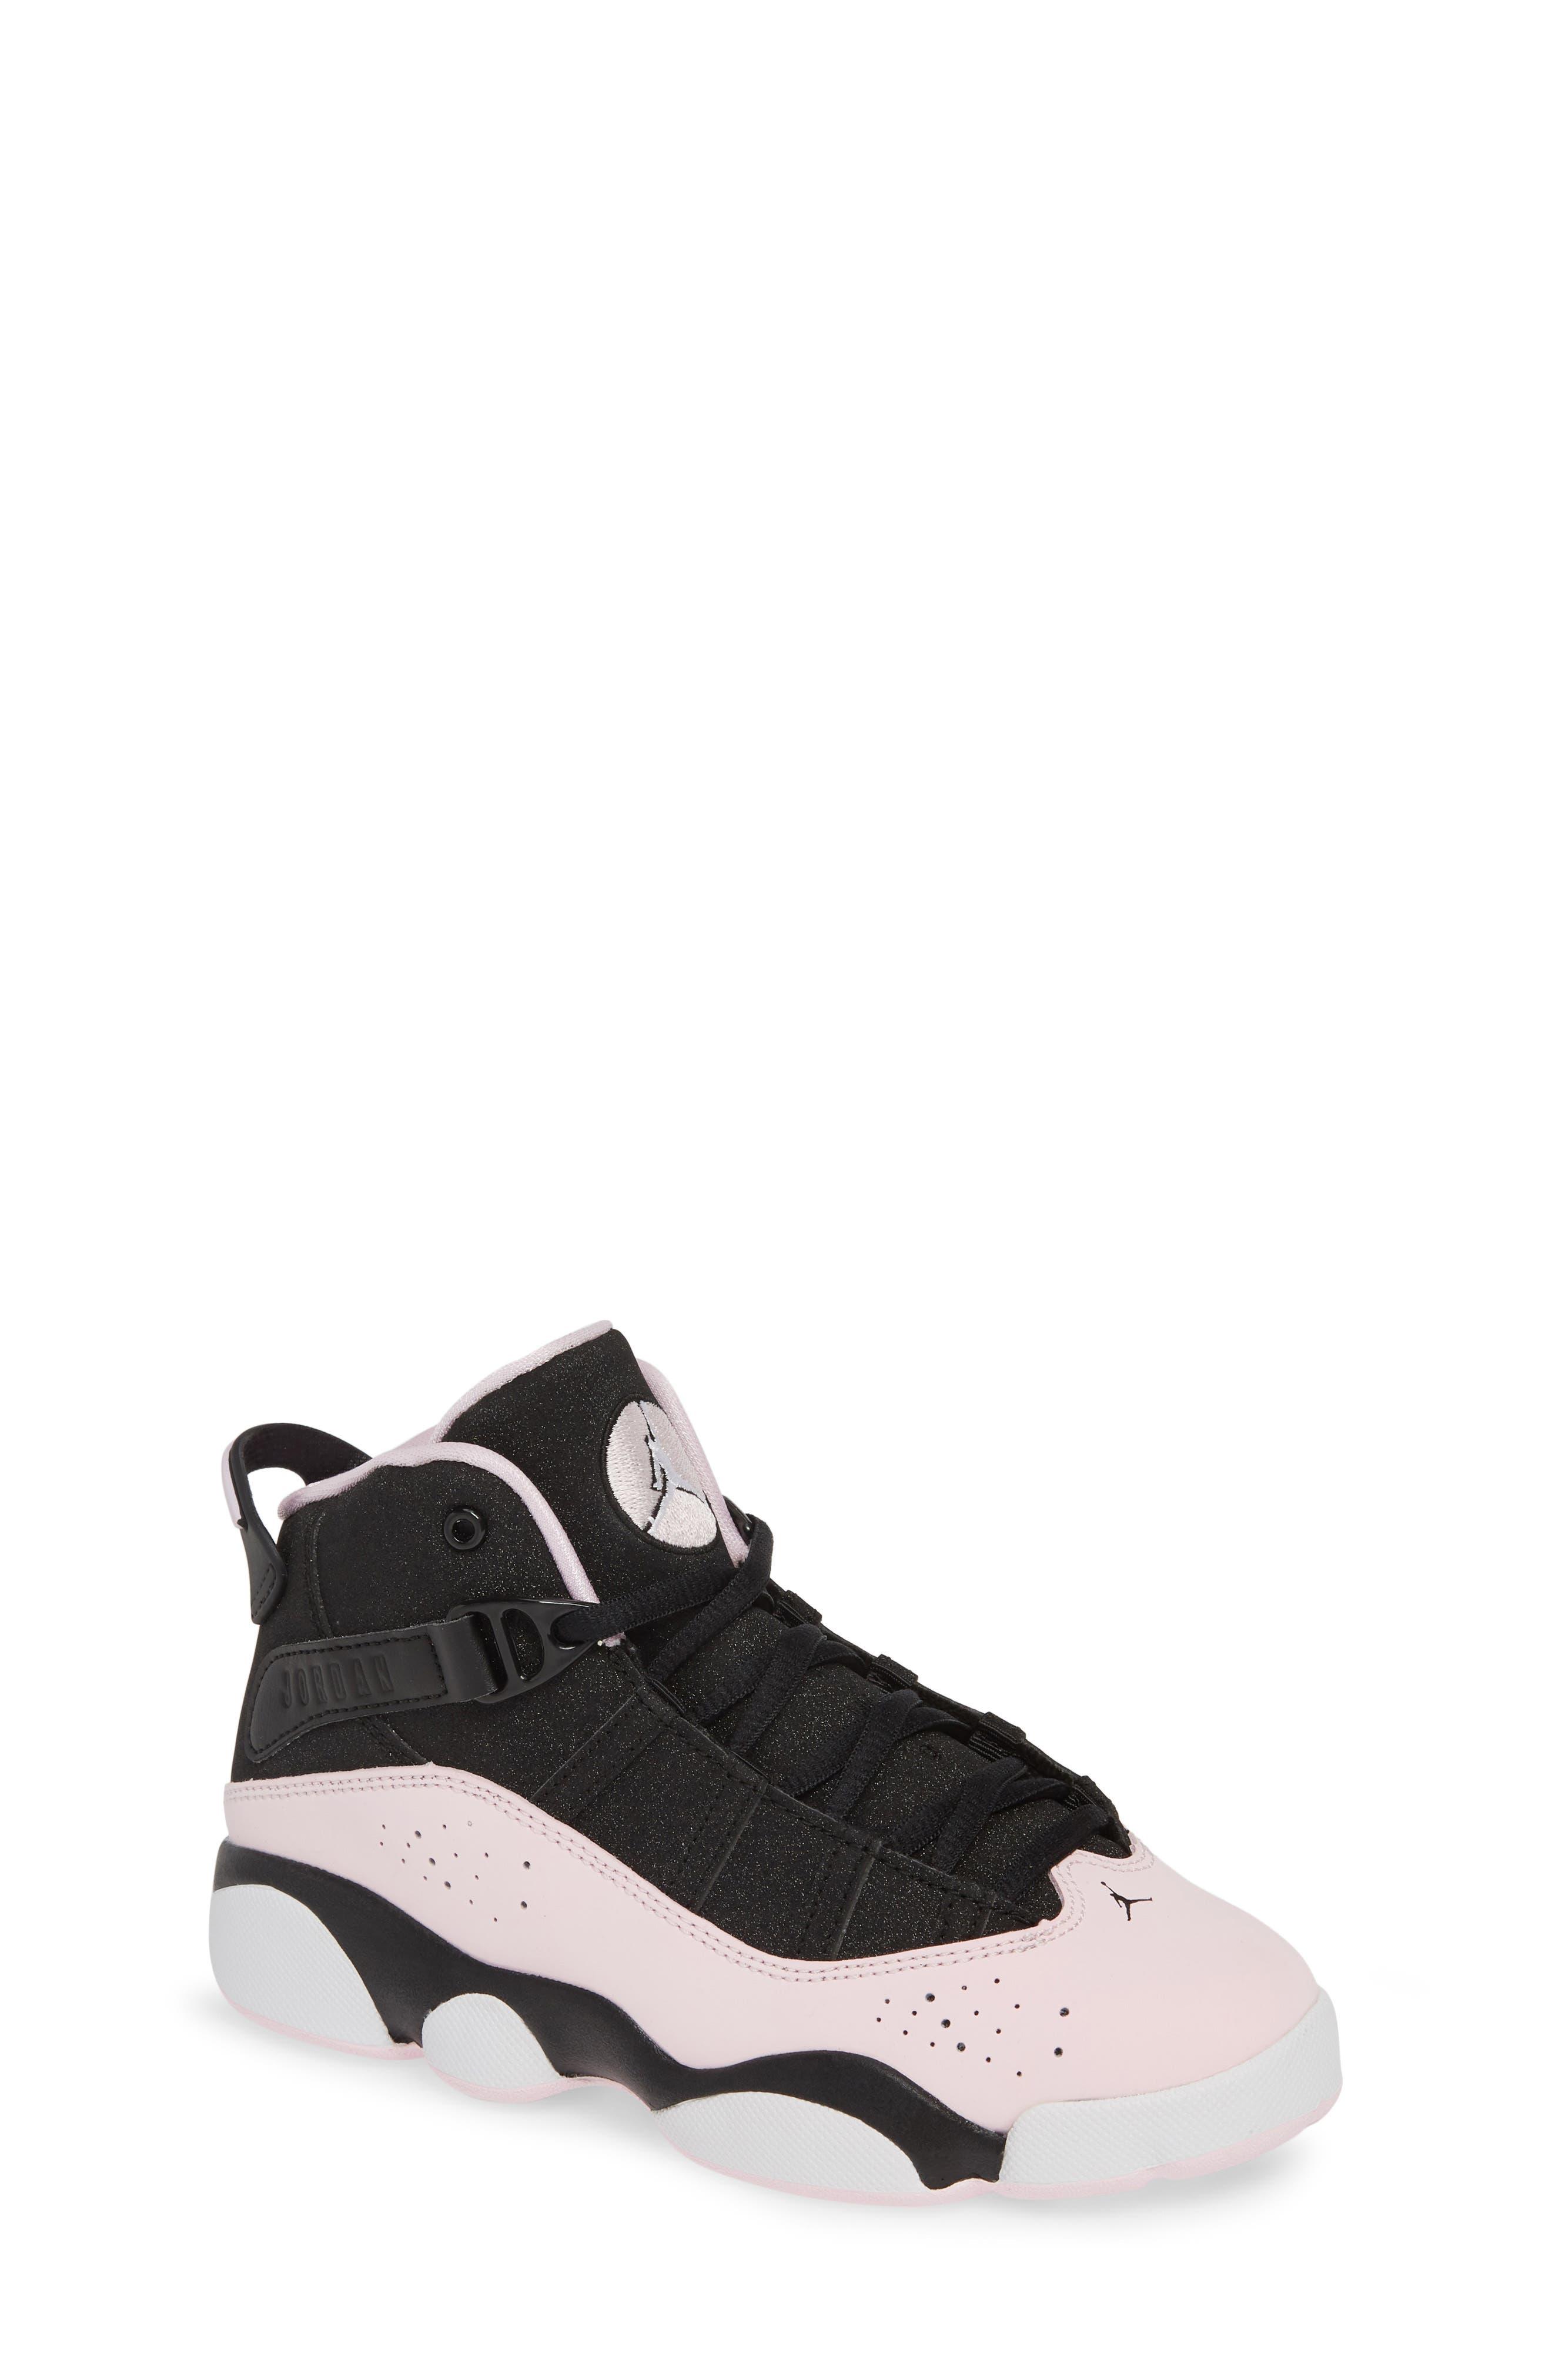 Jordan Sneakers UPC & Barcode   upcitemdb com